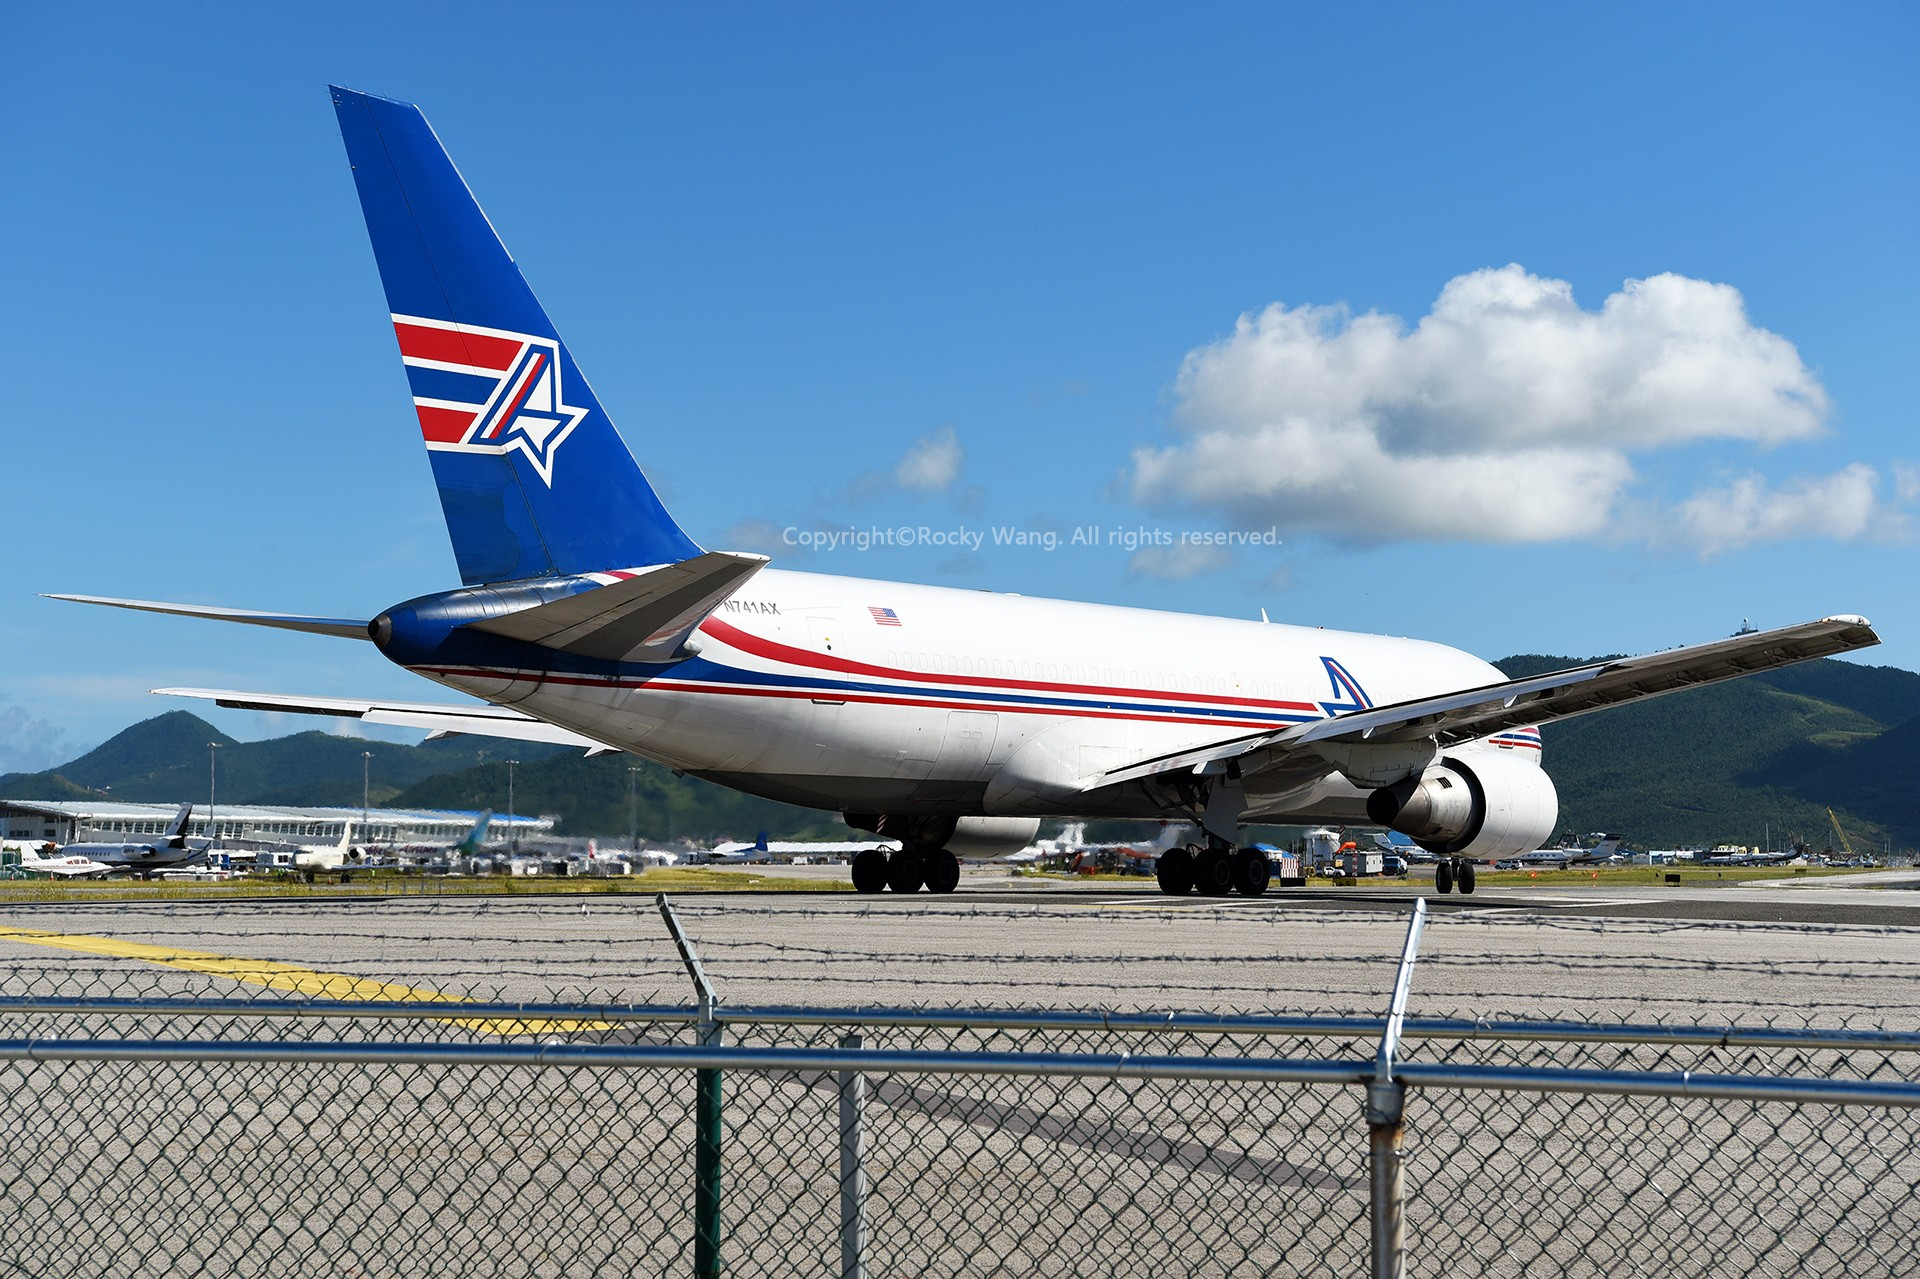 Re:[原创]My endless Caribbean dream——圣马丁朱莉安娜公主机场拍机记 BOEING 767-232(SF) N741AX 荷属安的列斯群岛朱利安娜公主机场